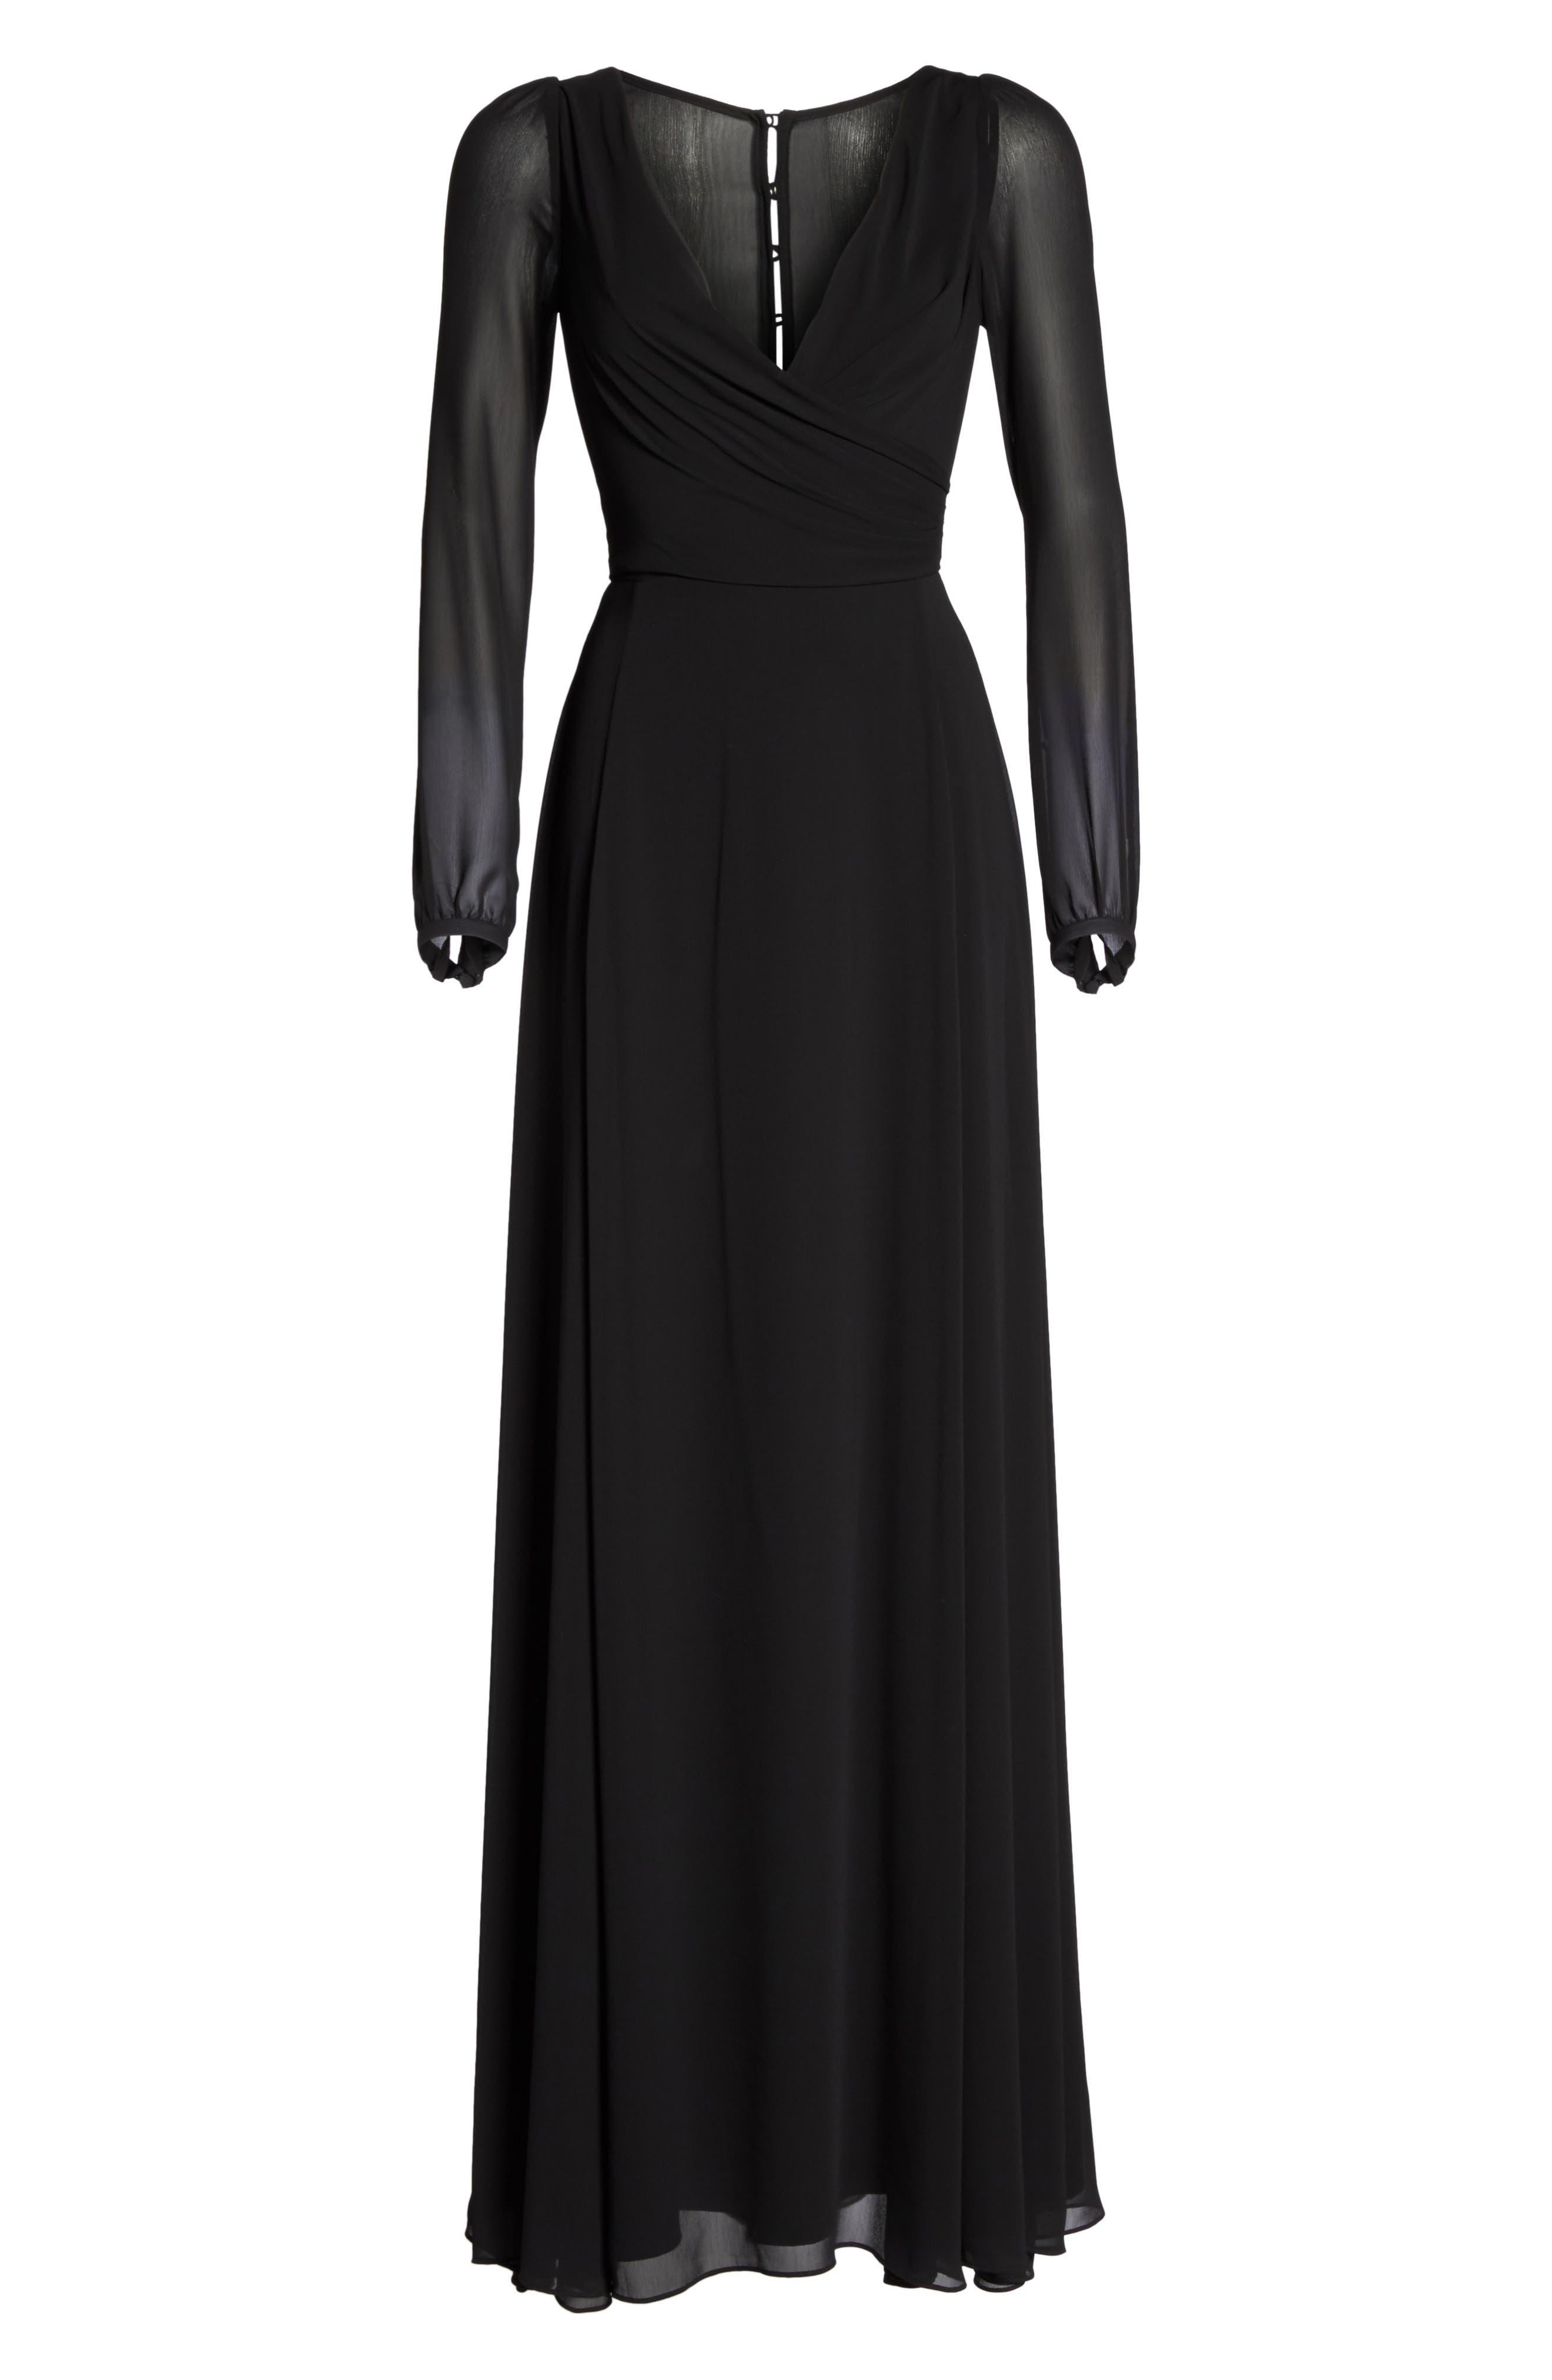 Donna Luxe Chiffon Surplice A-Line Gown,                             Alternate thumbnail 6, color,                             001